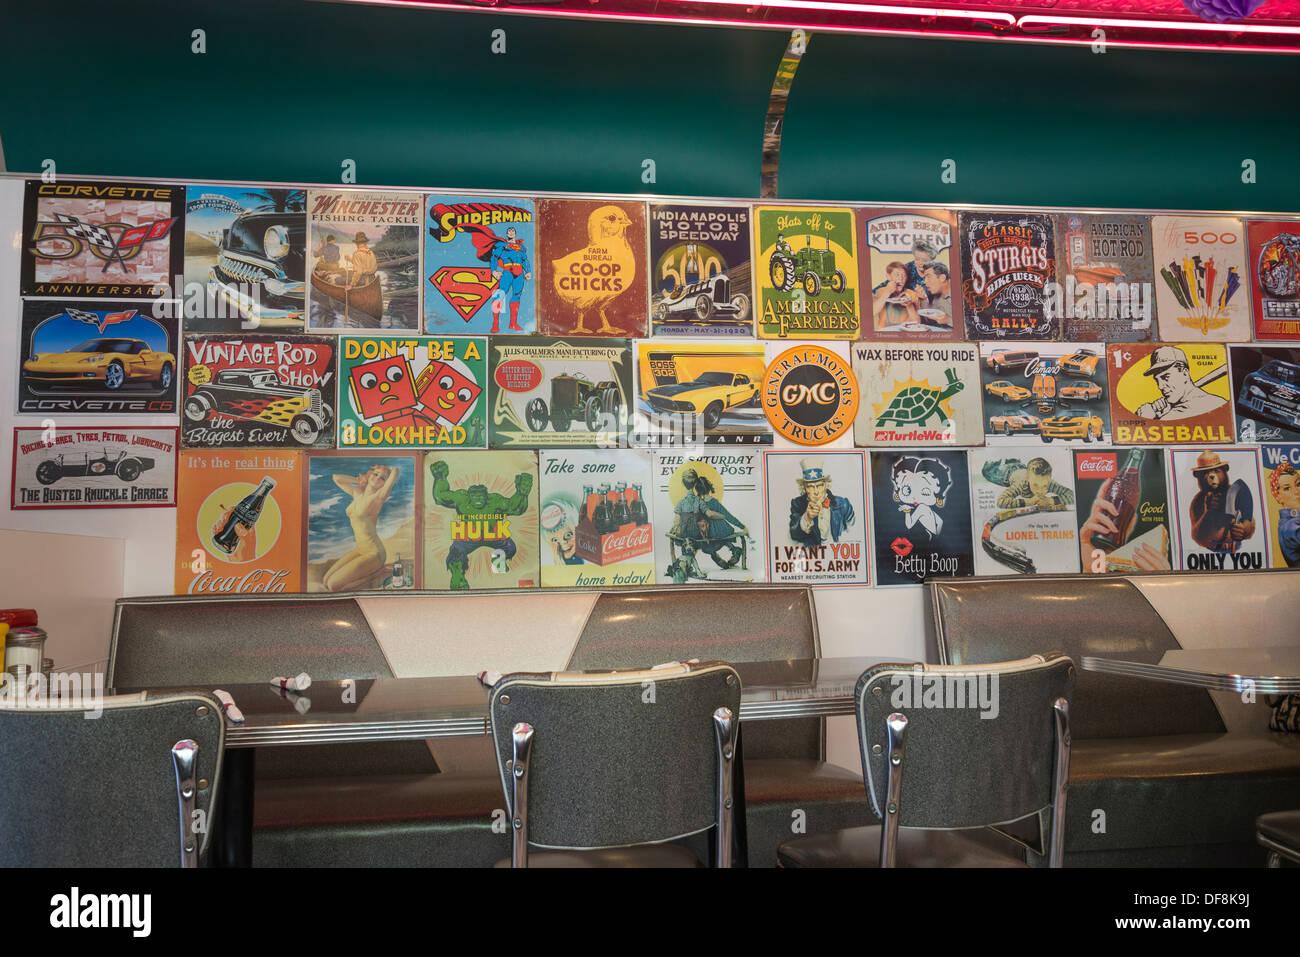 Interior Of American Diner Stock Photos Amp Interior Of